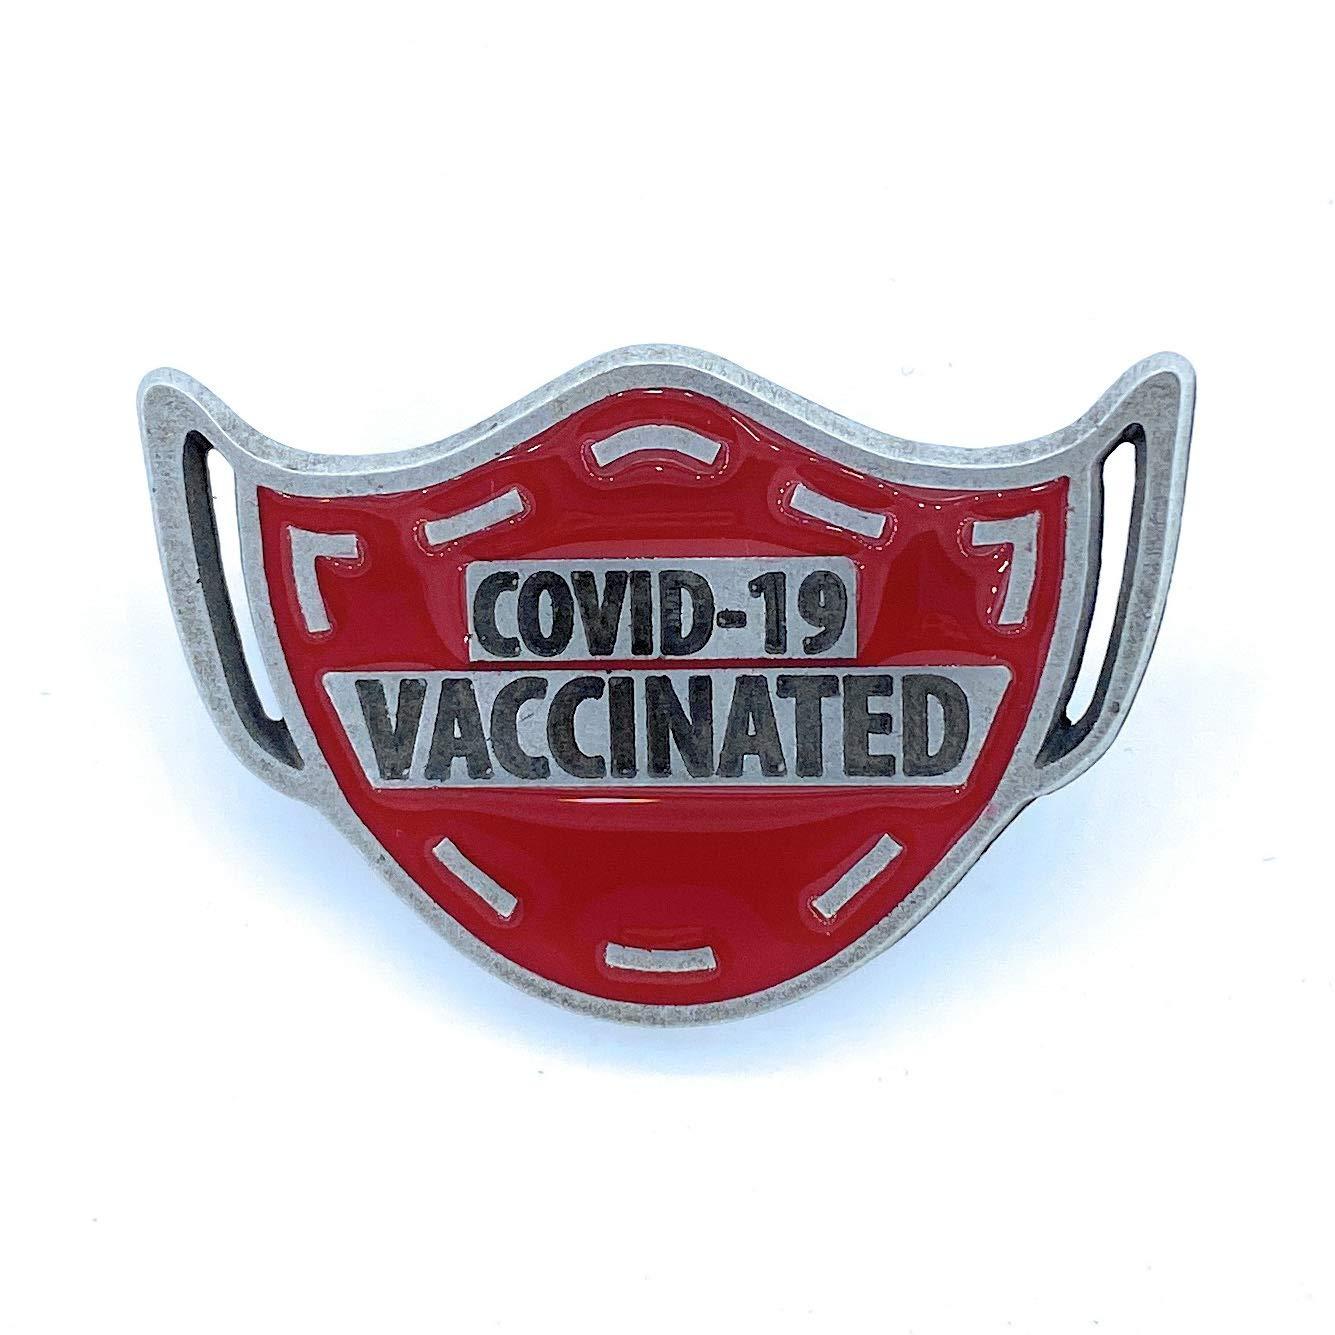 HESTAI COVID-19 Awareness Pin mRNA vaccine badge Vaccination Pin Black and Green